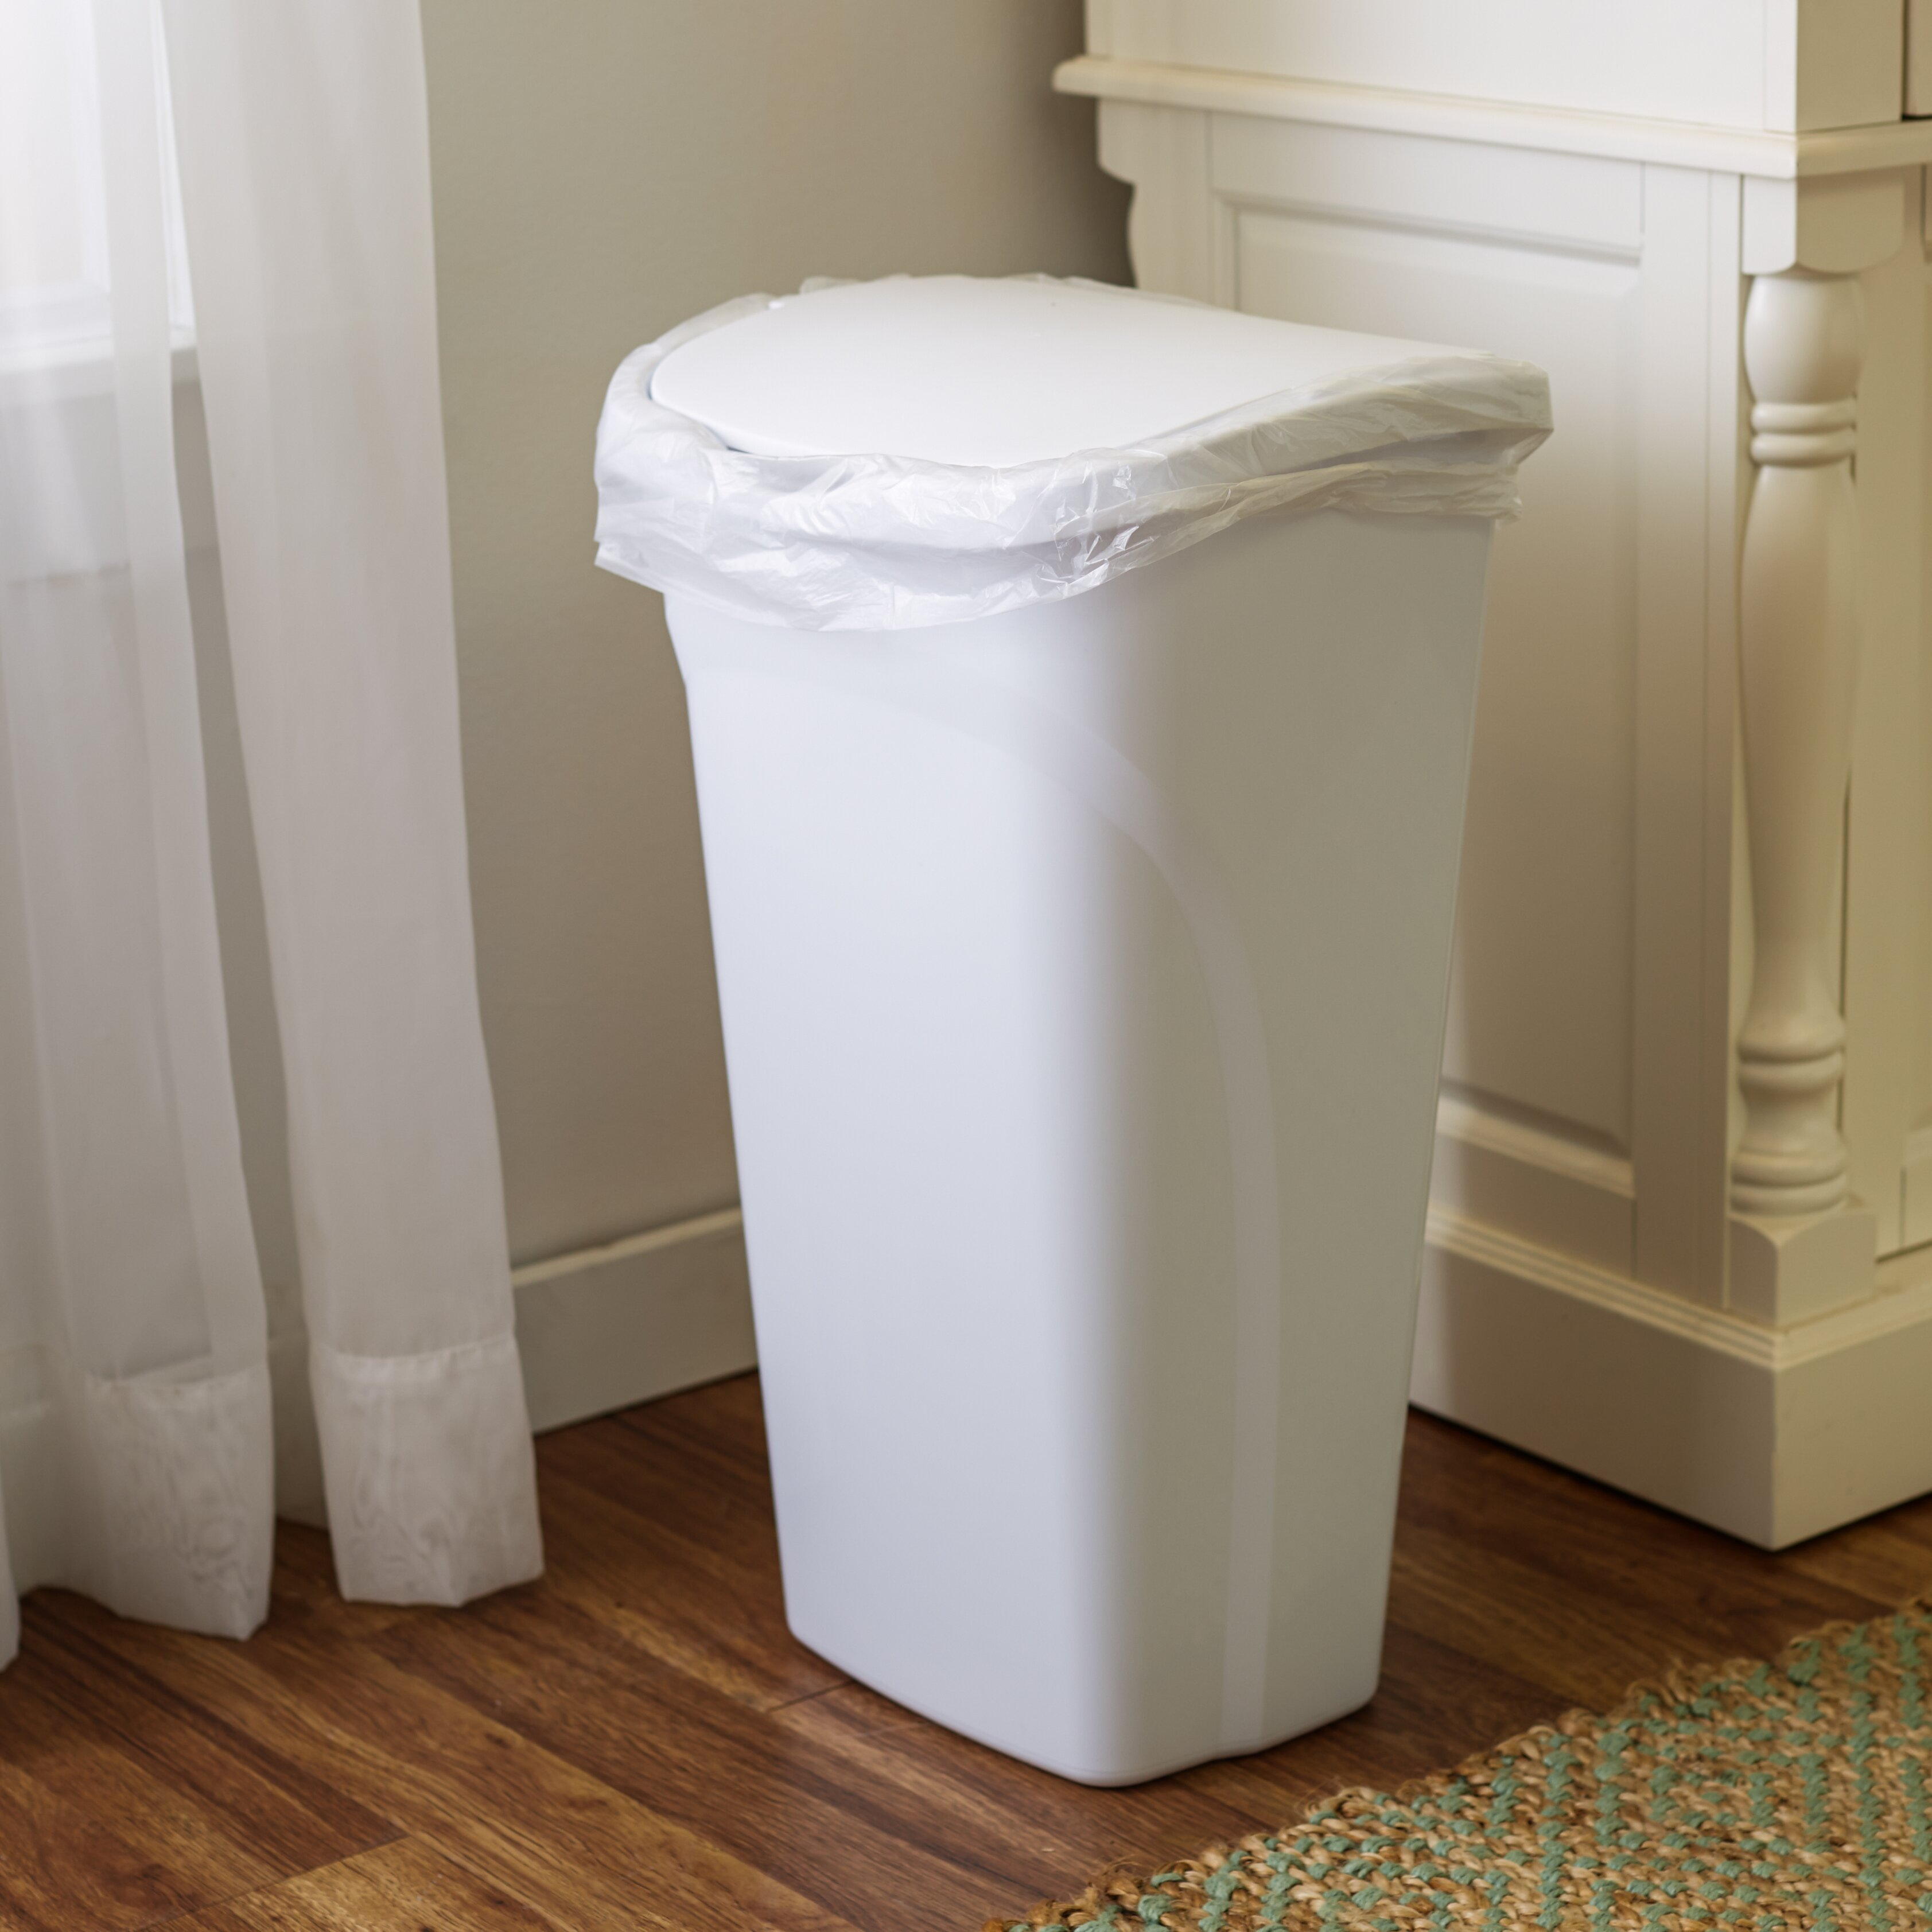 wayfair basics wayfair basics 10 gal dual swing trash can reviews. Black Bedroom Furniture Sets. Home Design Ideas